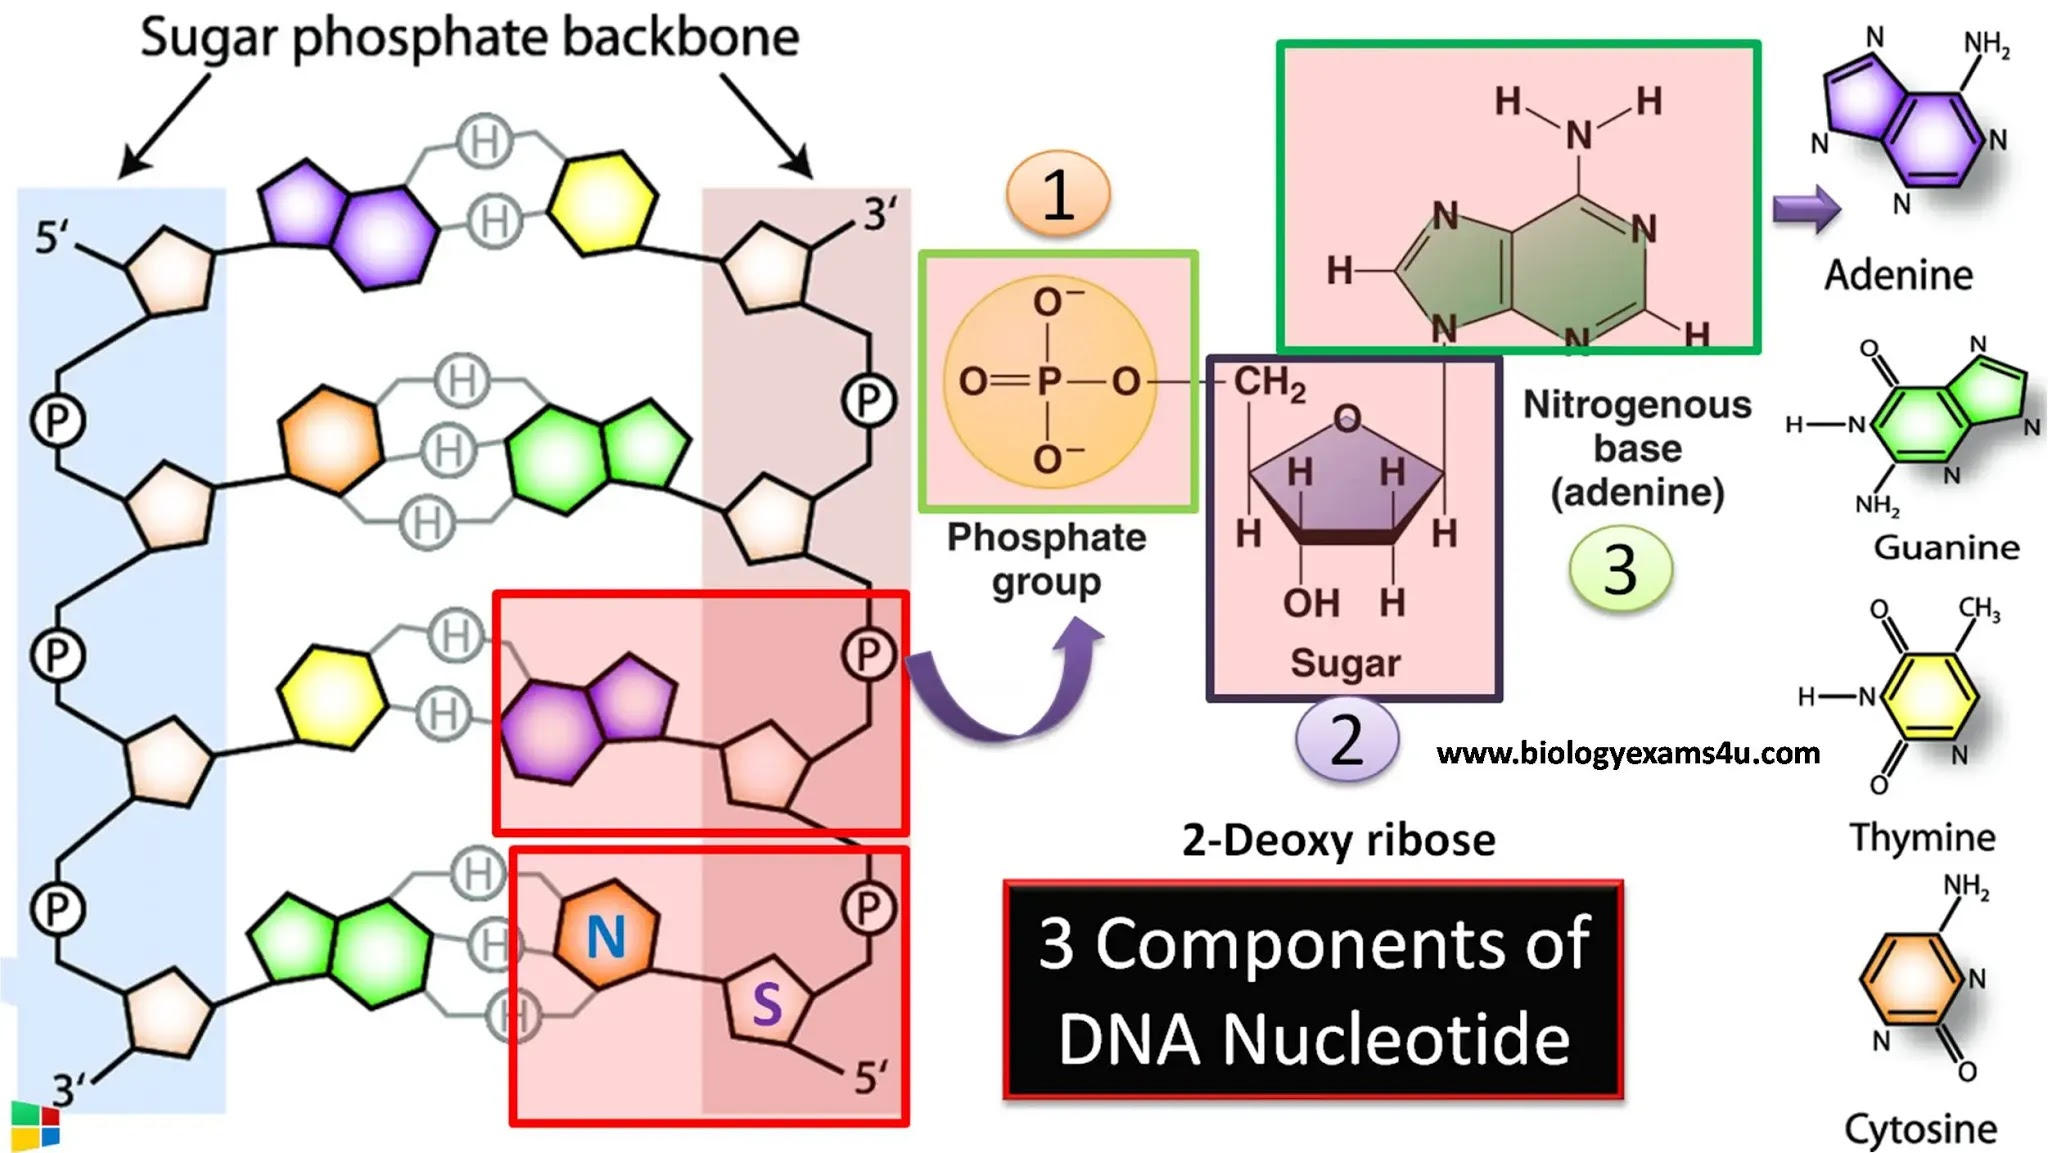 3 components of DNA nucleotide